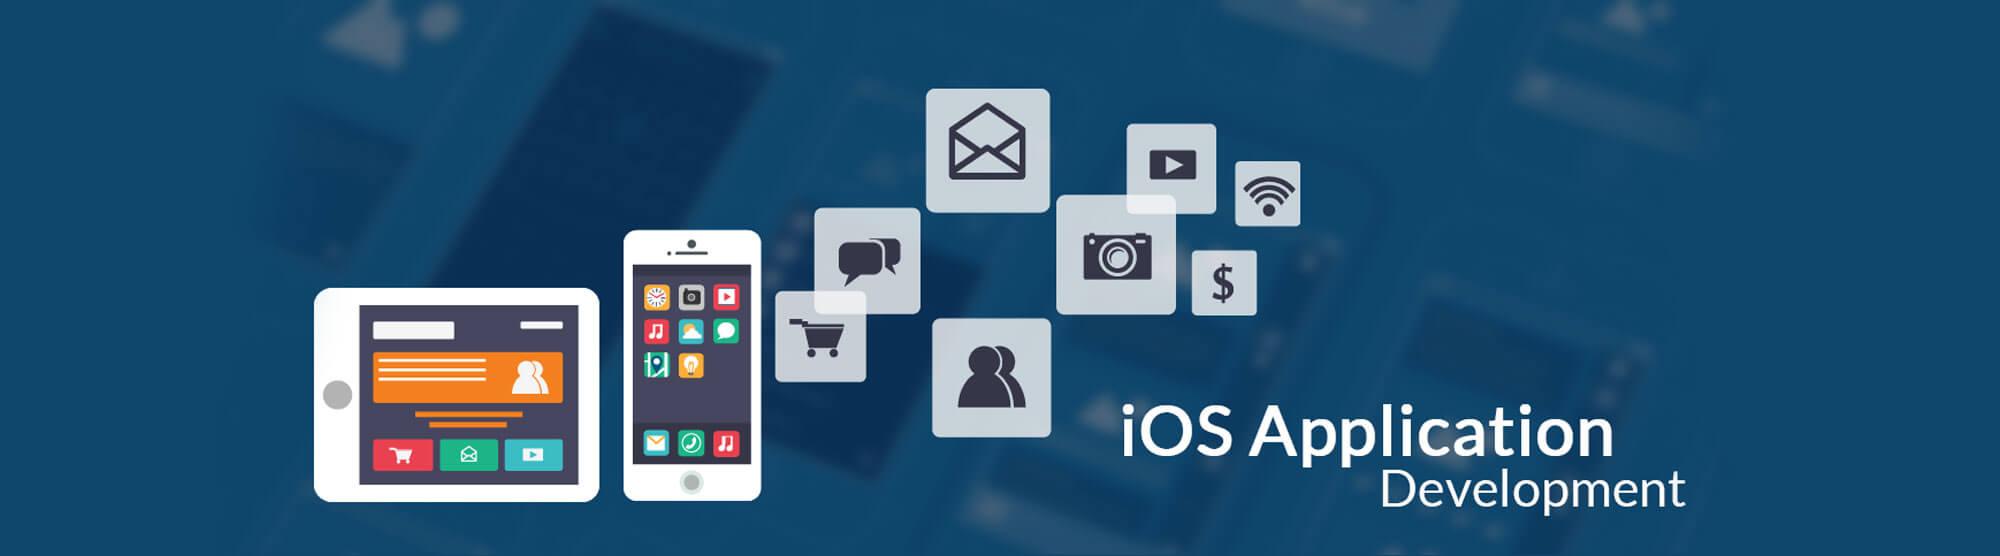 benefits of mobile application development